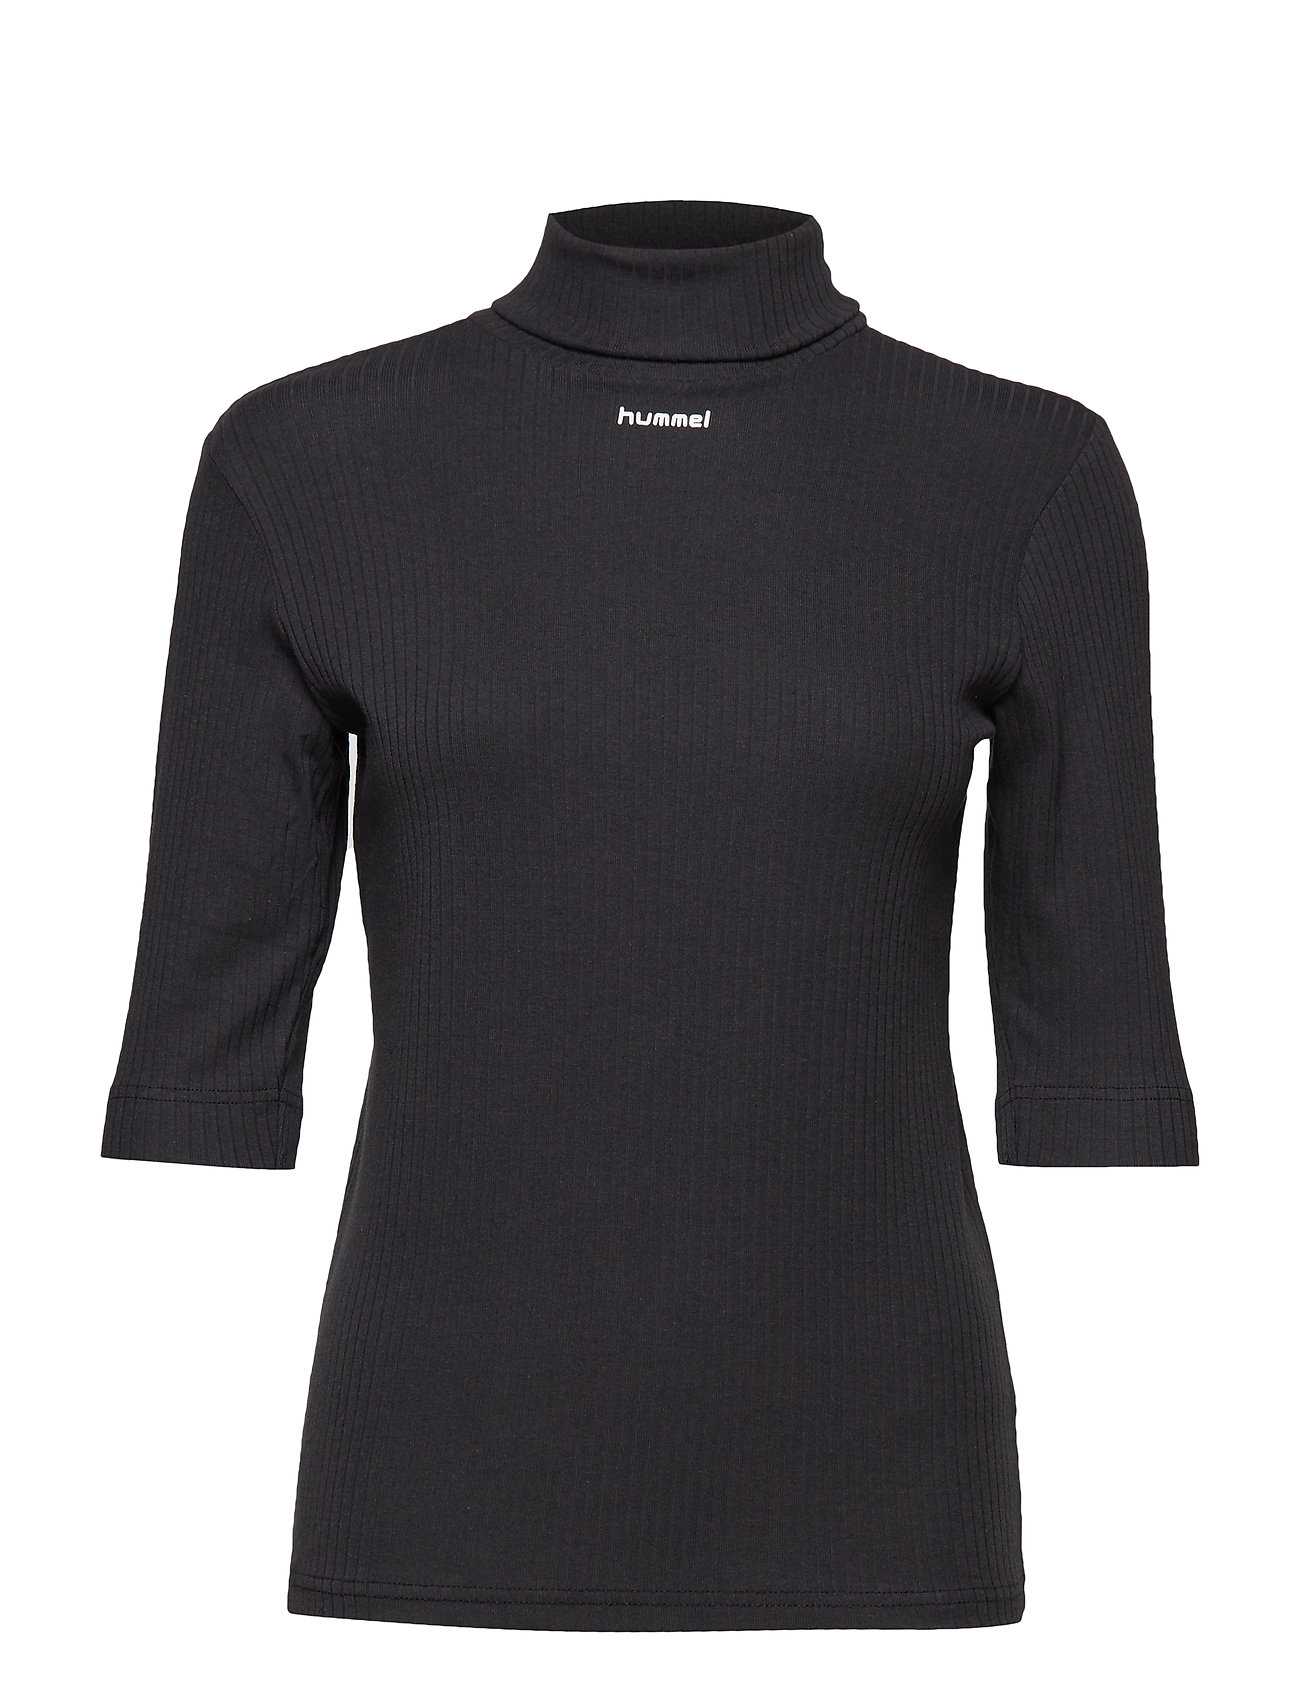 Hmlalberte T Shirt SS T shirt Top Sort Hummel Hive